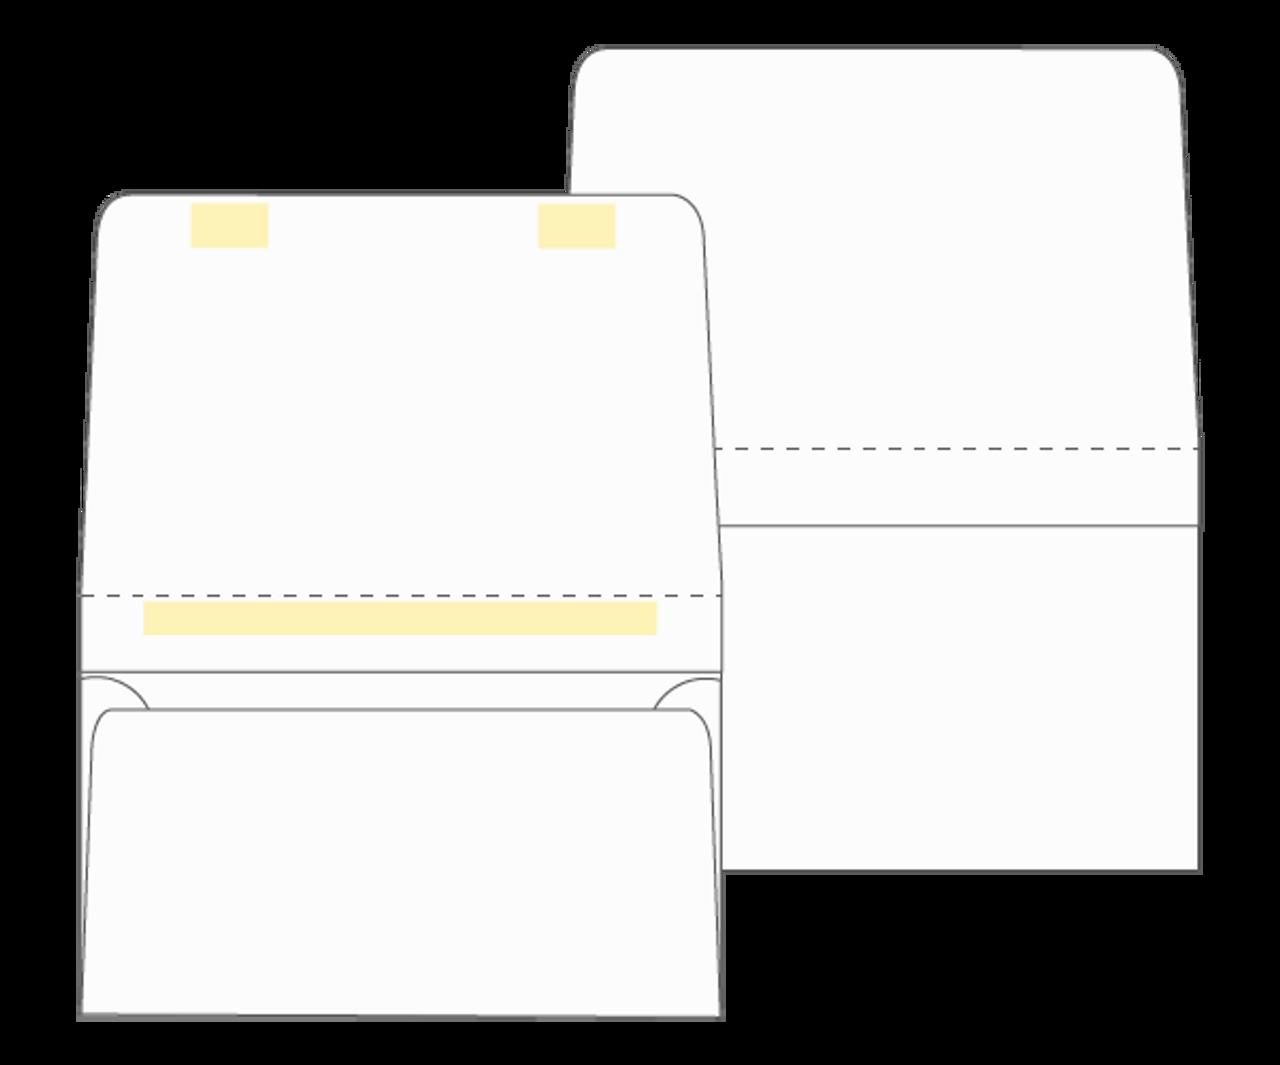 Dual Purpose Mailer - Tear Off Remittance Envelope (Blank) - EB1501